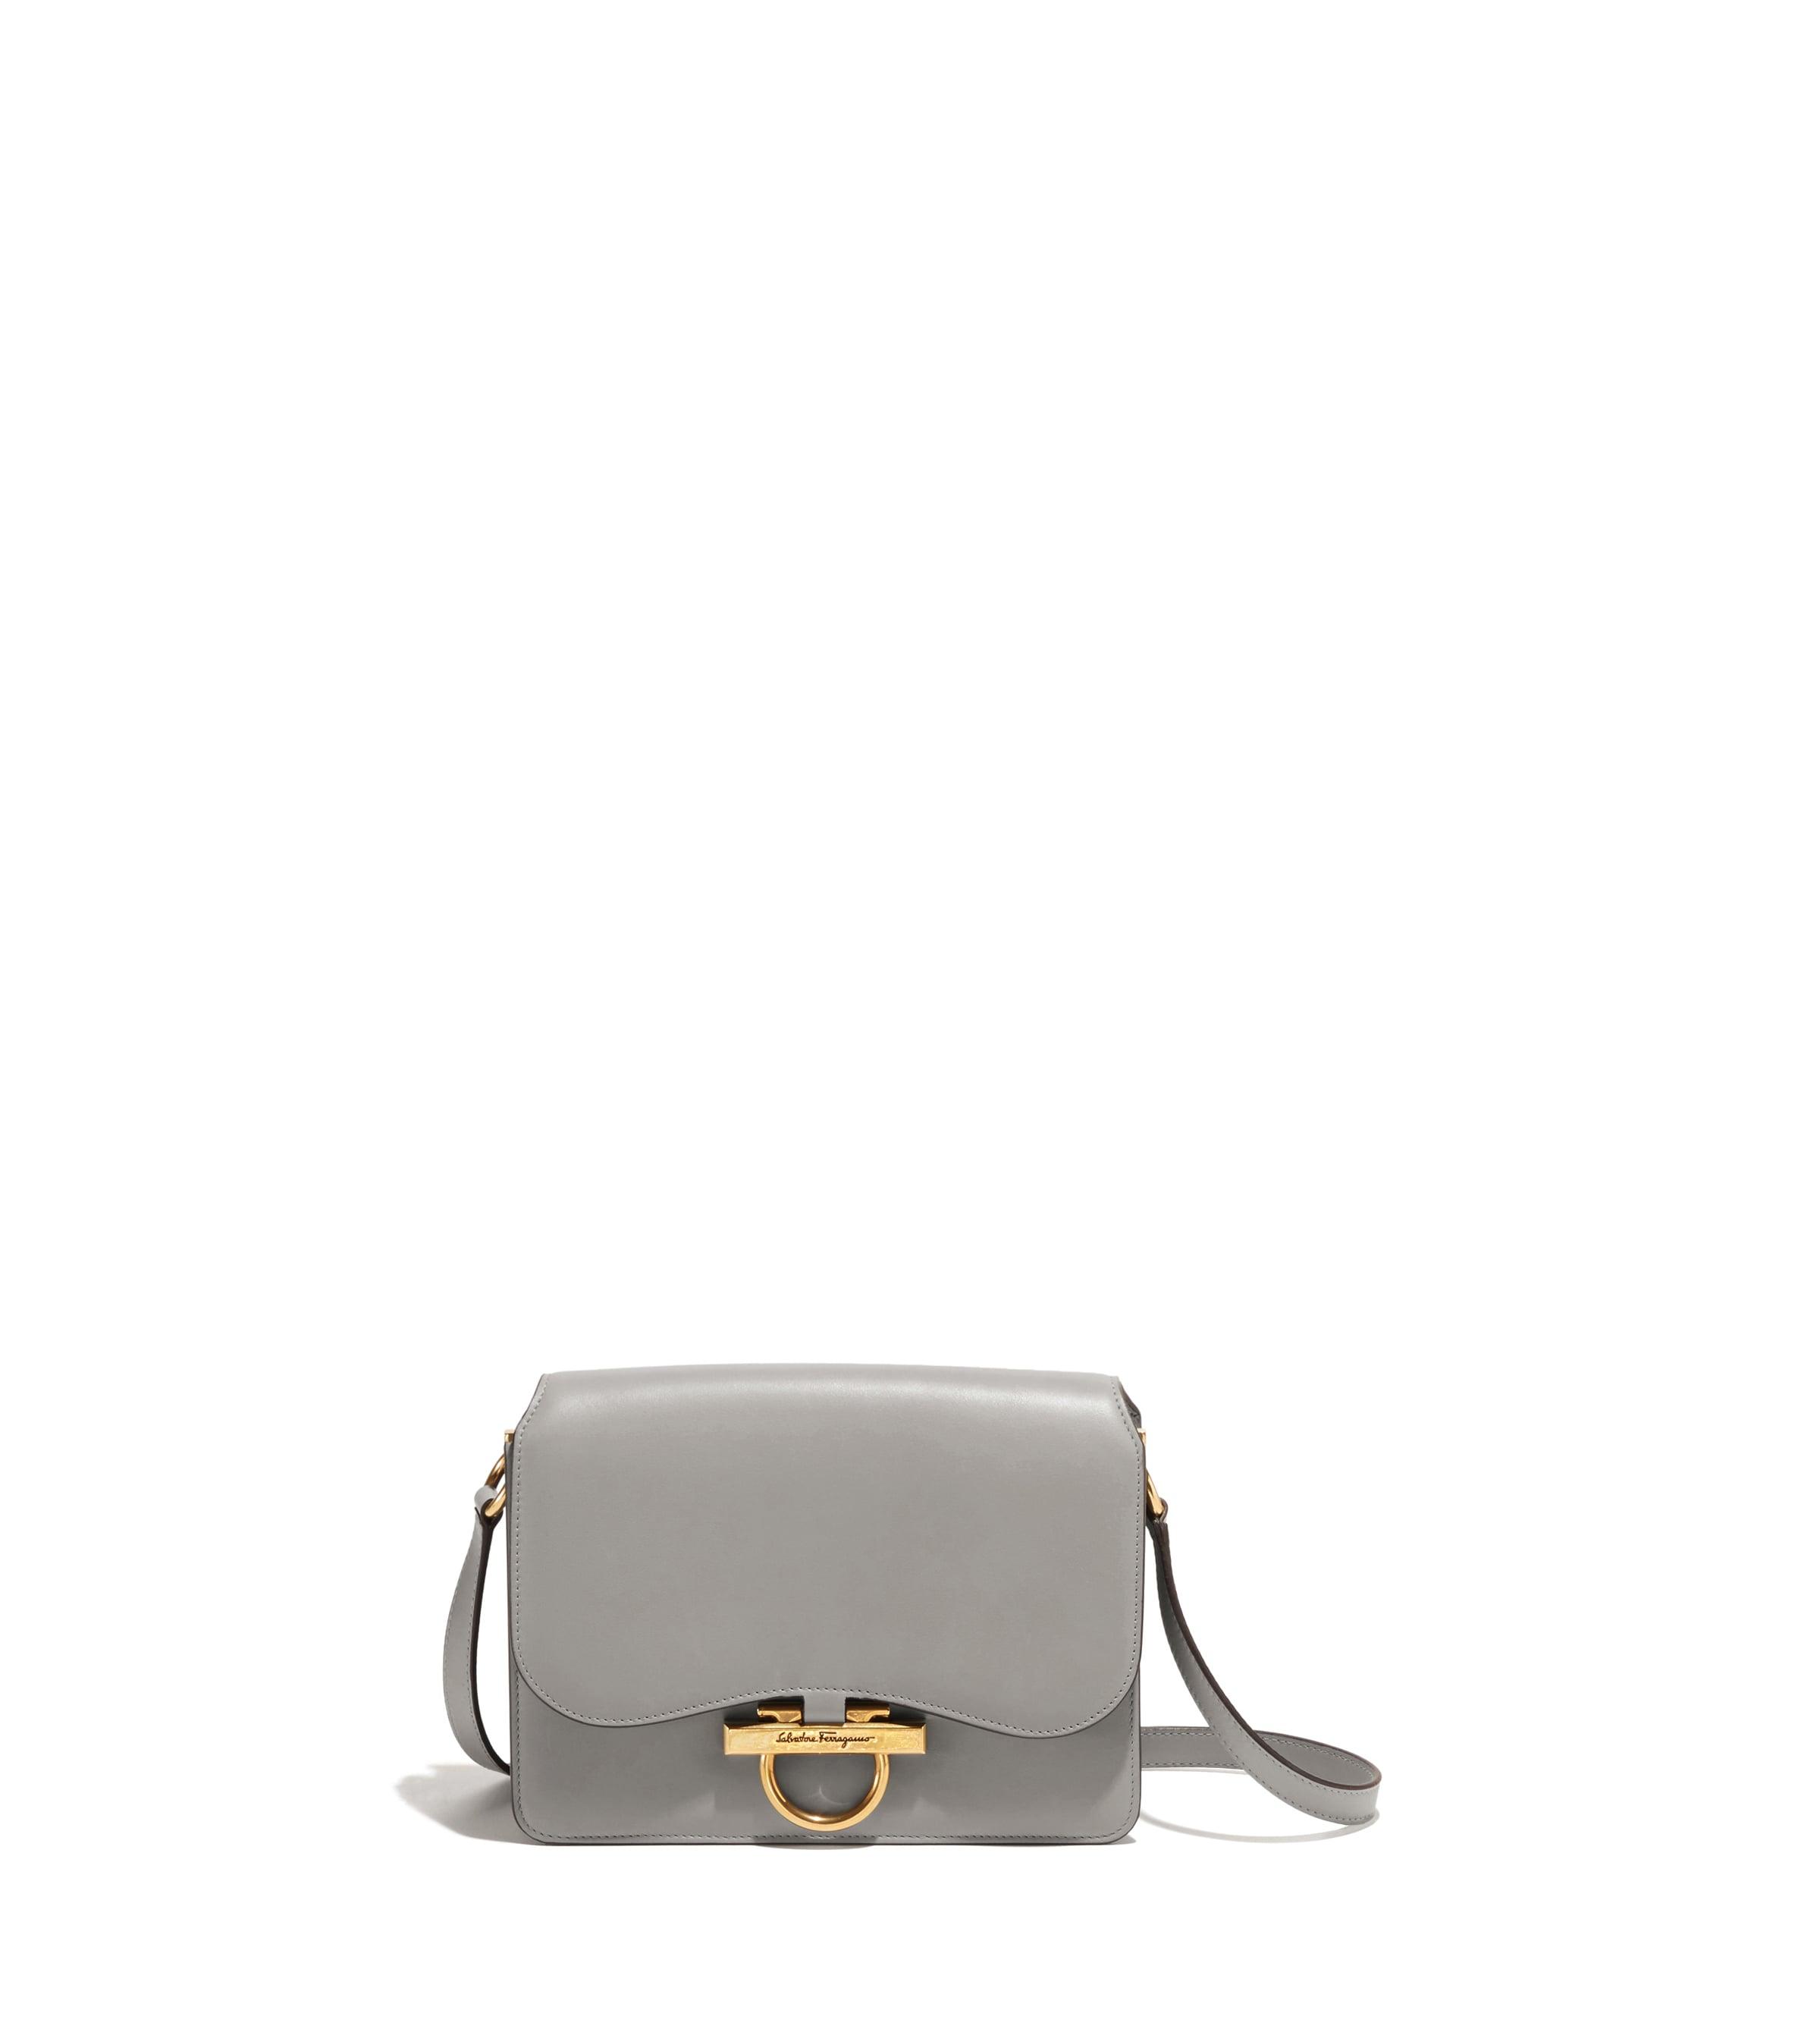 Gancini flap bag - Crossbody bags - Handbags - Women - Salvatore Ferragamo EU